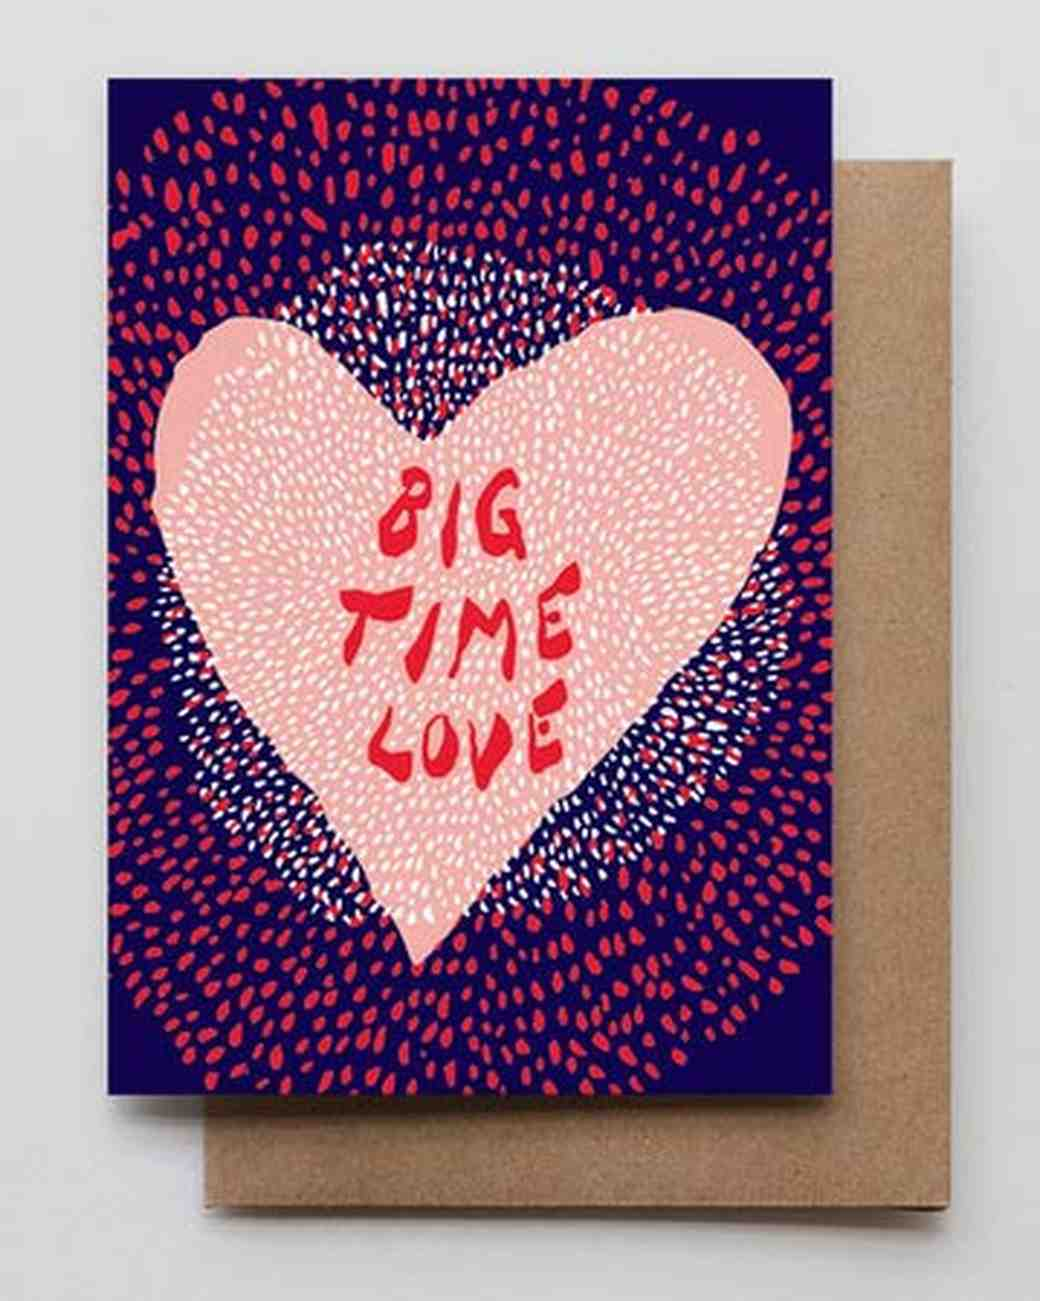 vday-cards-we-love-hammer-press-big-time-love-0216.jpg